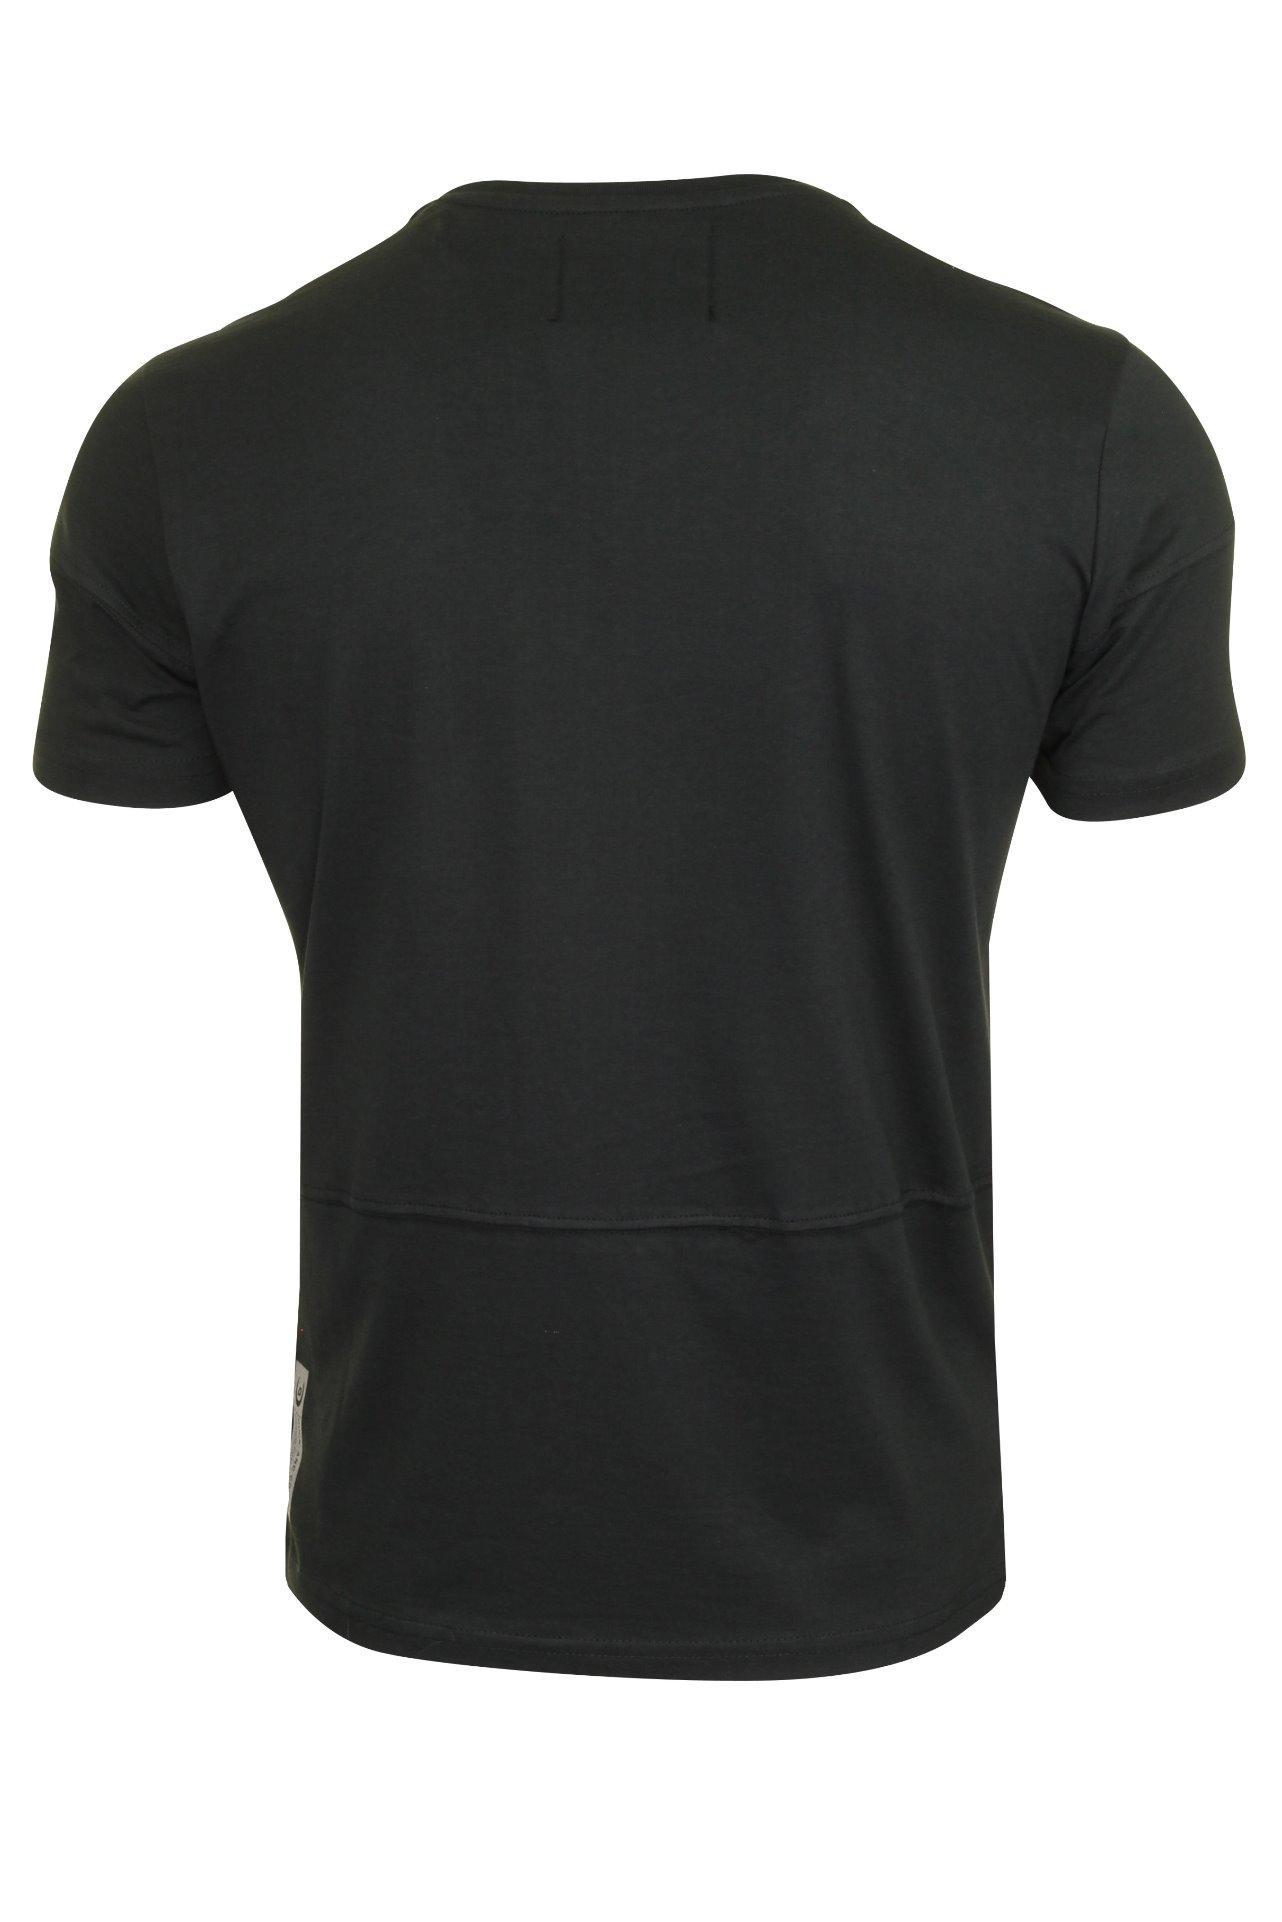 Duck-and-Cover-Hombre-Camiseta-039-crosdale-039 miniatura 5